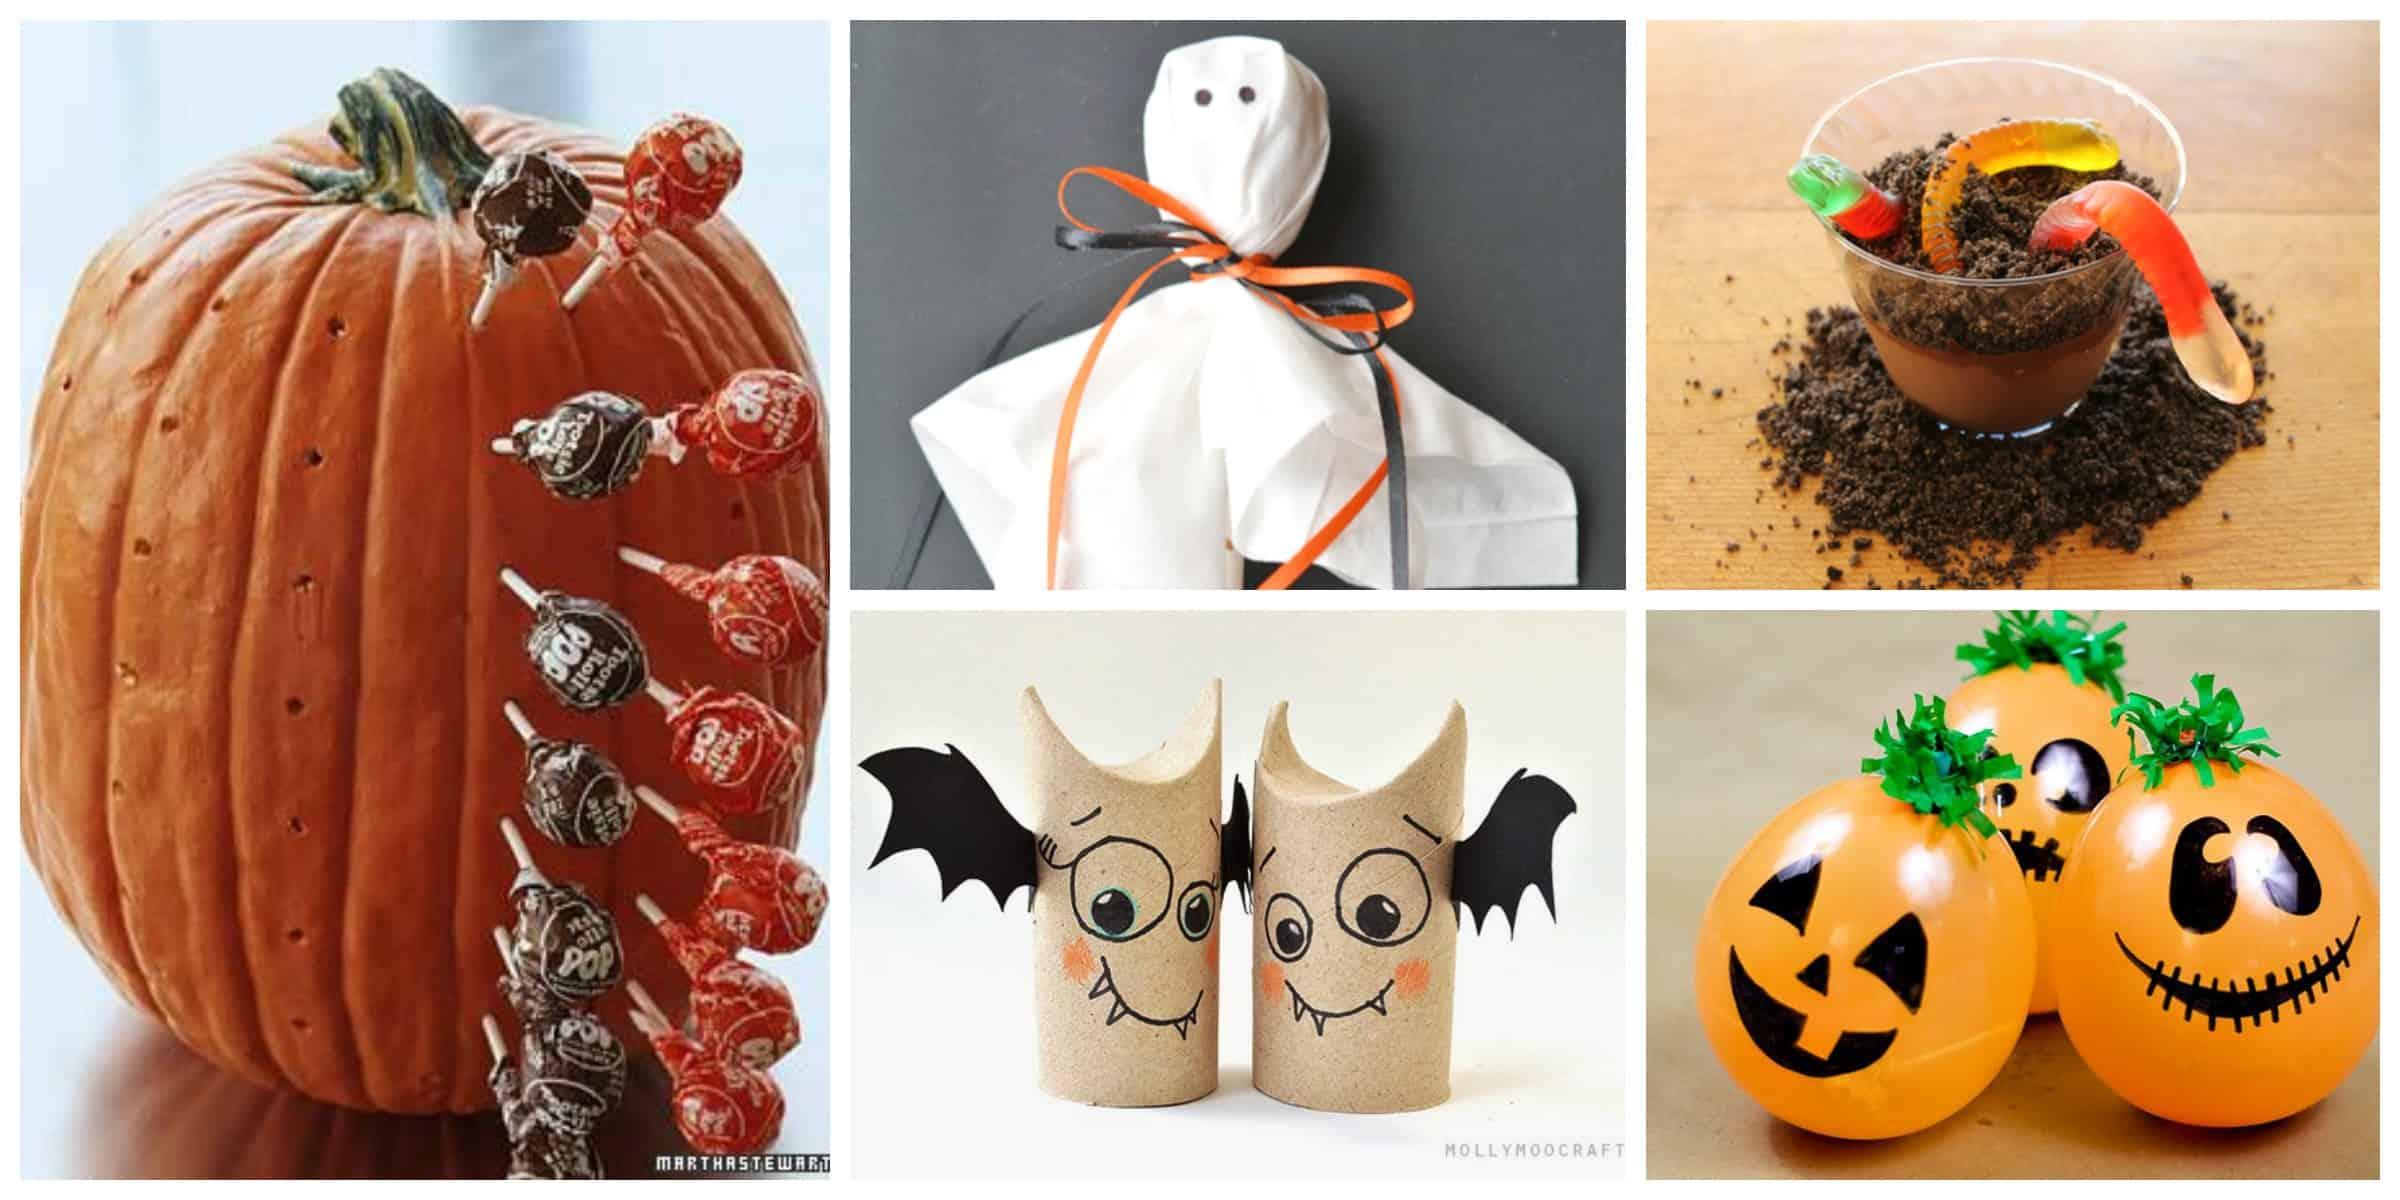 Festa halloween decorazioni fai da te